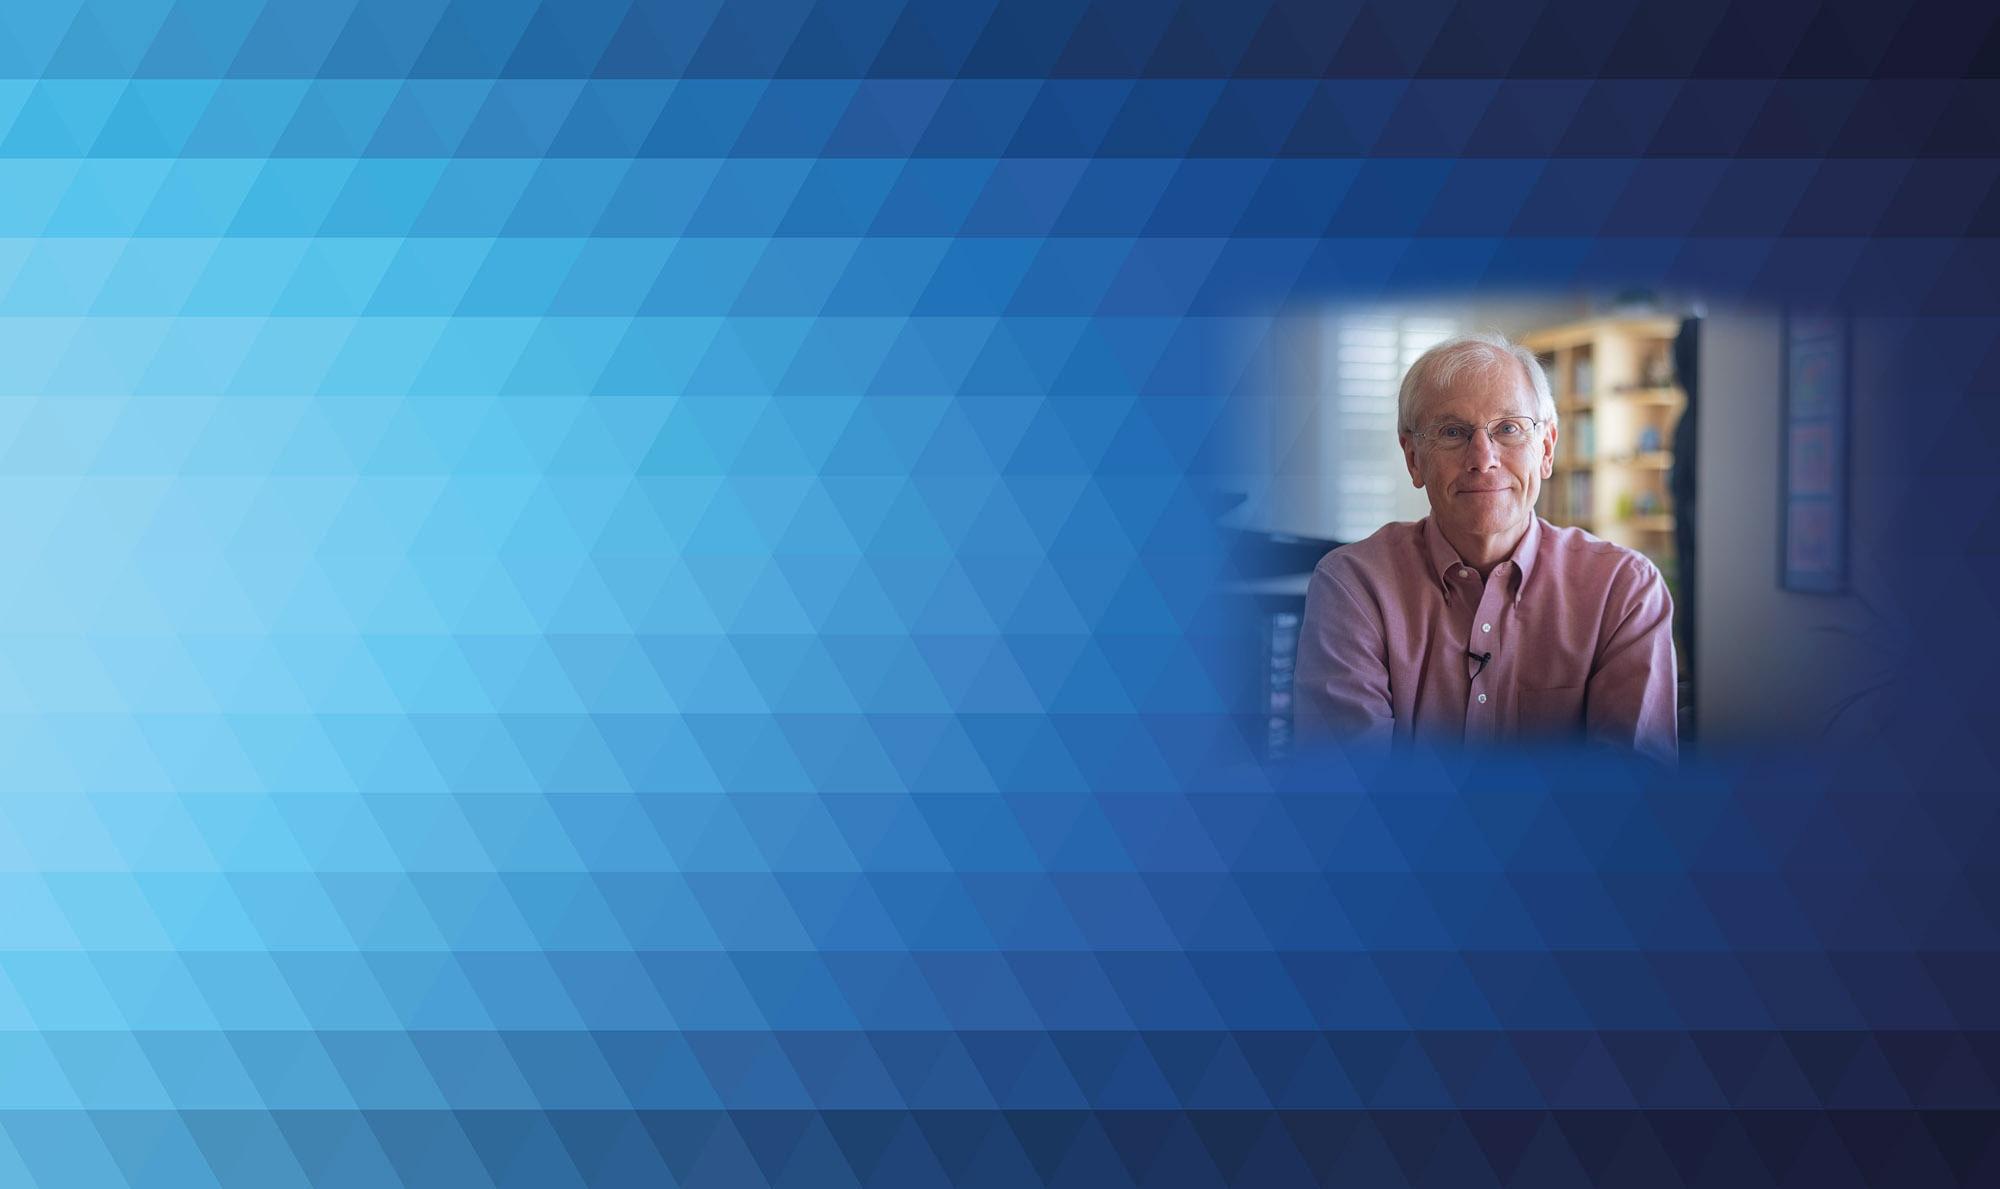 background_webinar_bluetriangles2.jpg